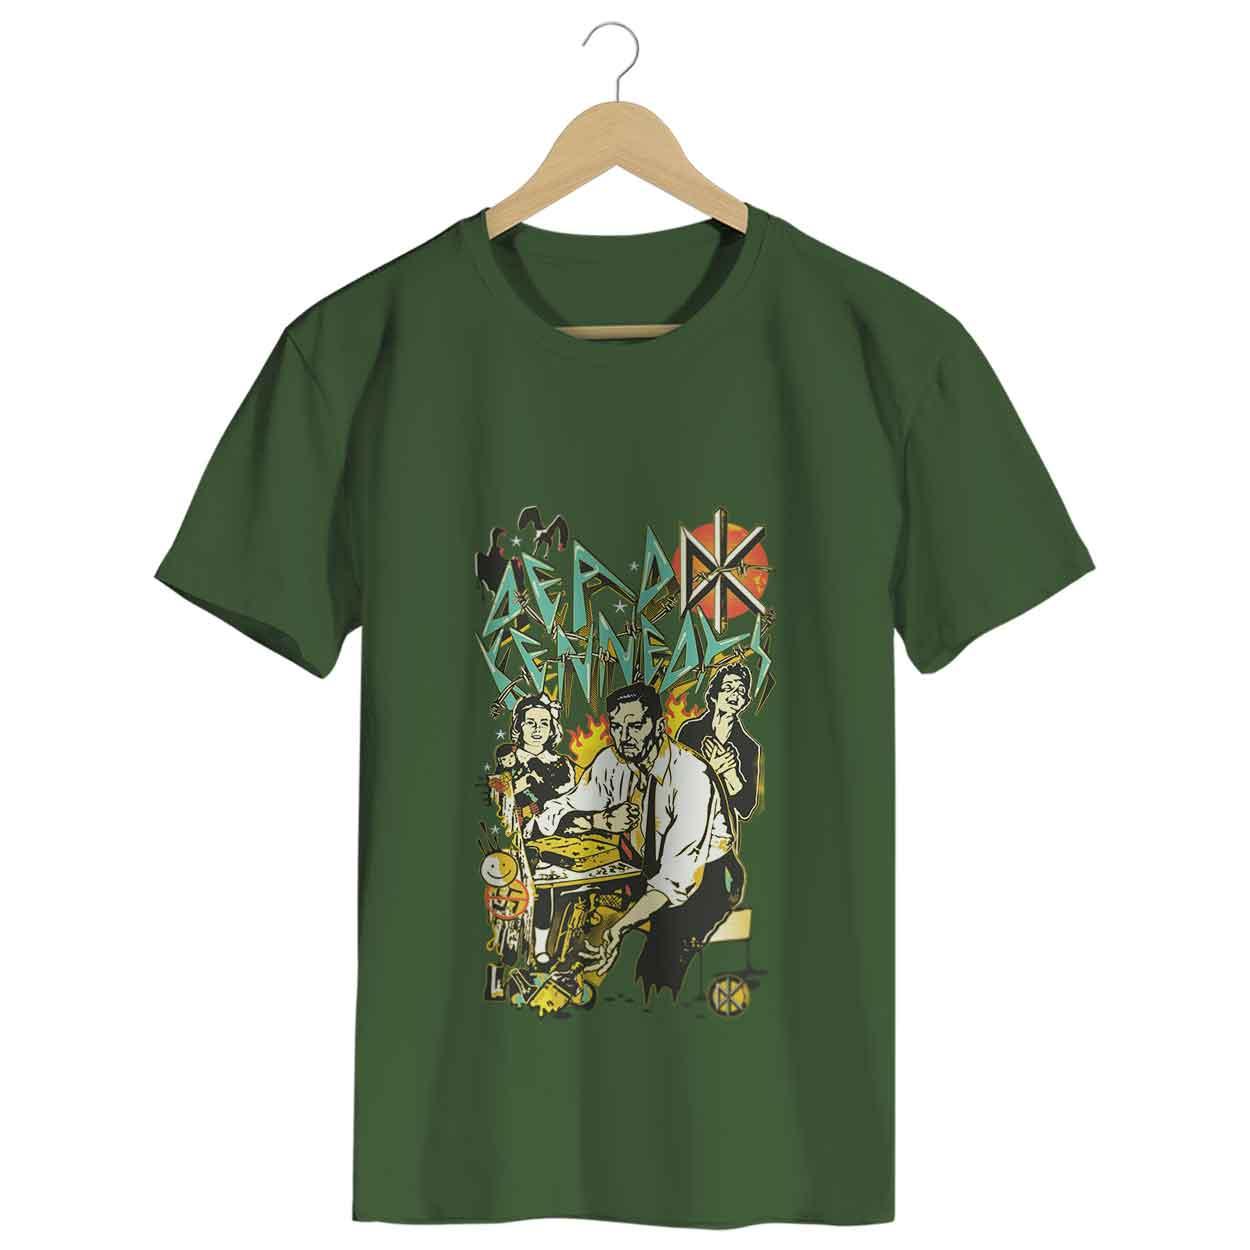 Camiseta Dead Kennedys - Masculino